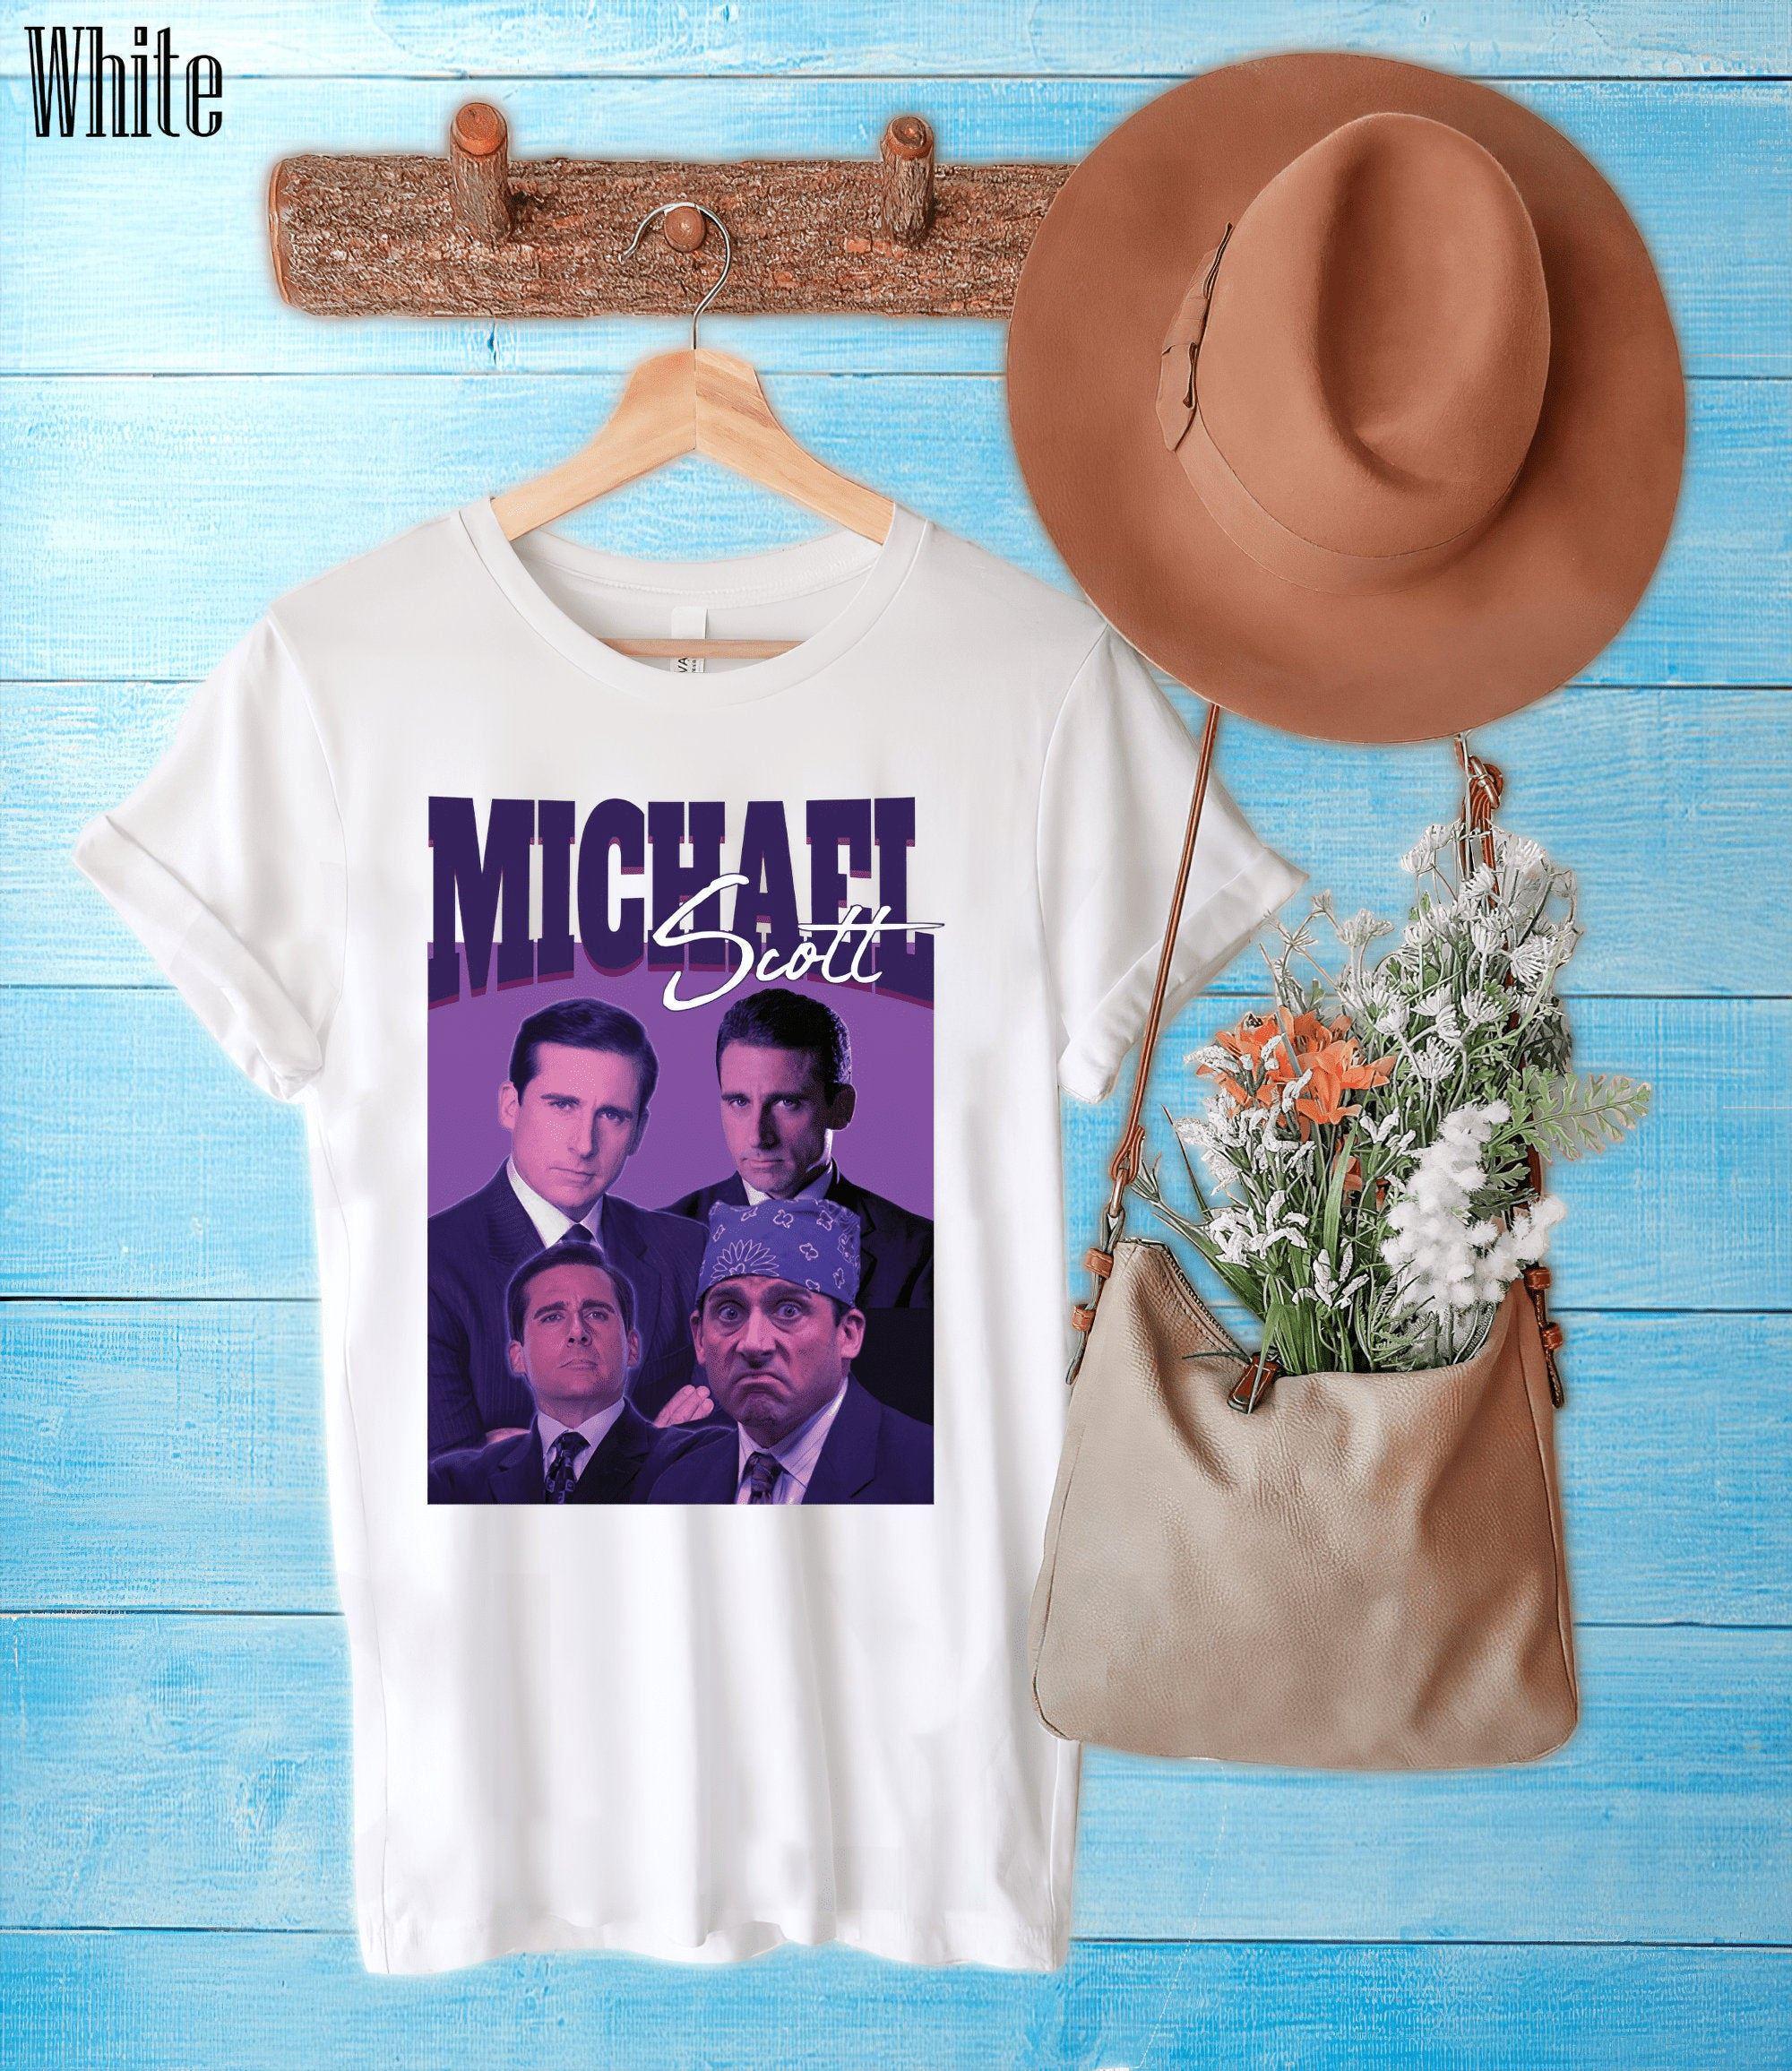 Michael Scott Homage 90s Retro Vintage T Shirt Us Office Tv Show Unisex Shirt Tv Show Vintage T Shirt Sweatshirt Hoodie